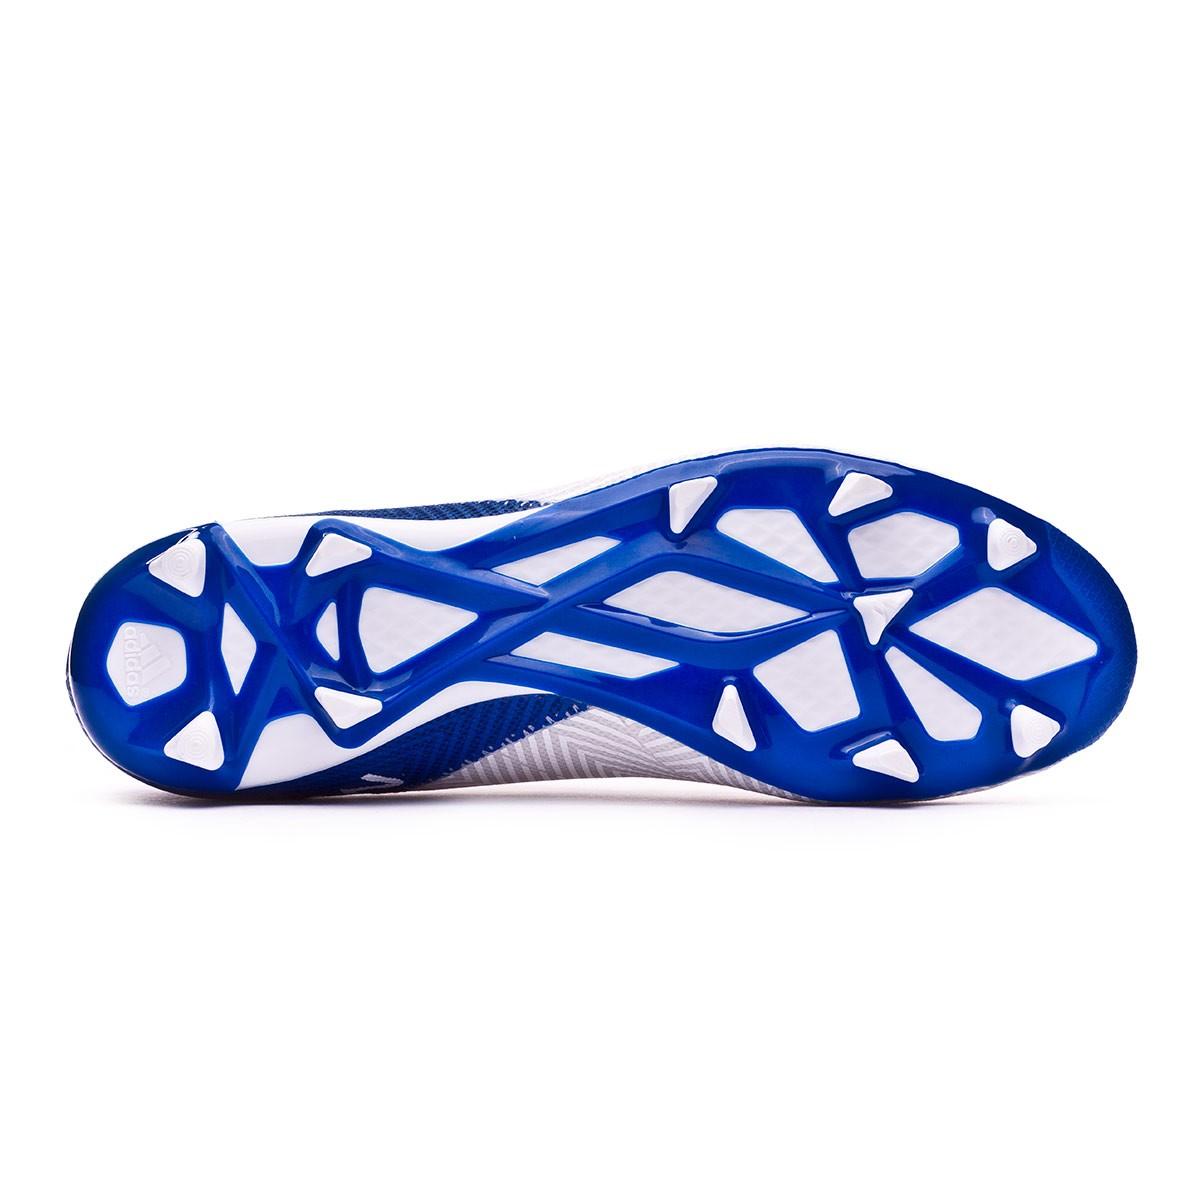 c080f3931 Football Boots adidas Nemeziz Messi 18.3 FG White-Core black-Football blue  - Football store Fútbol Emotion